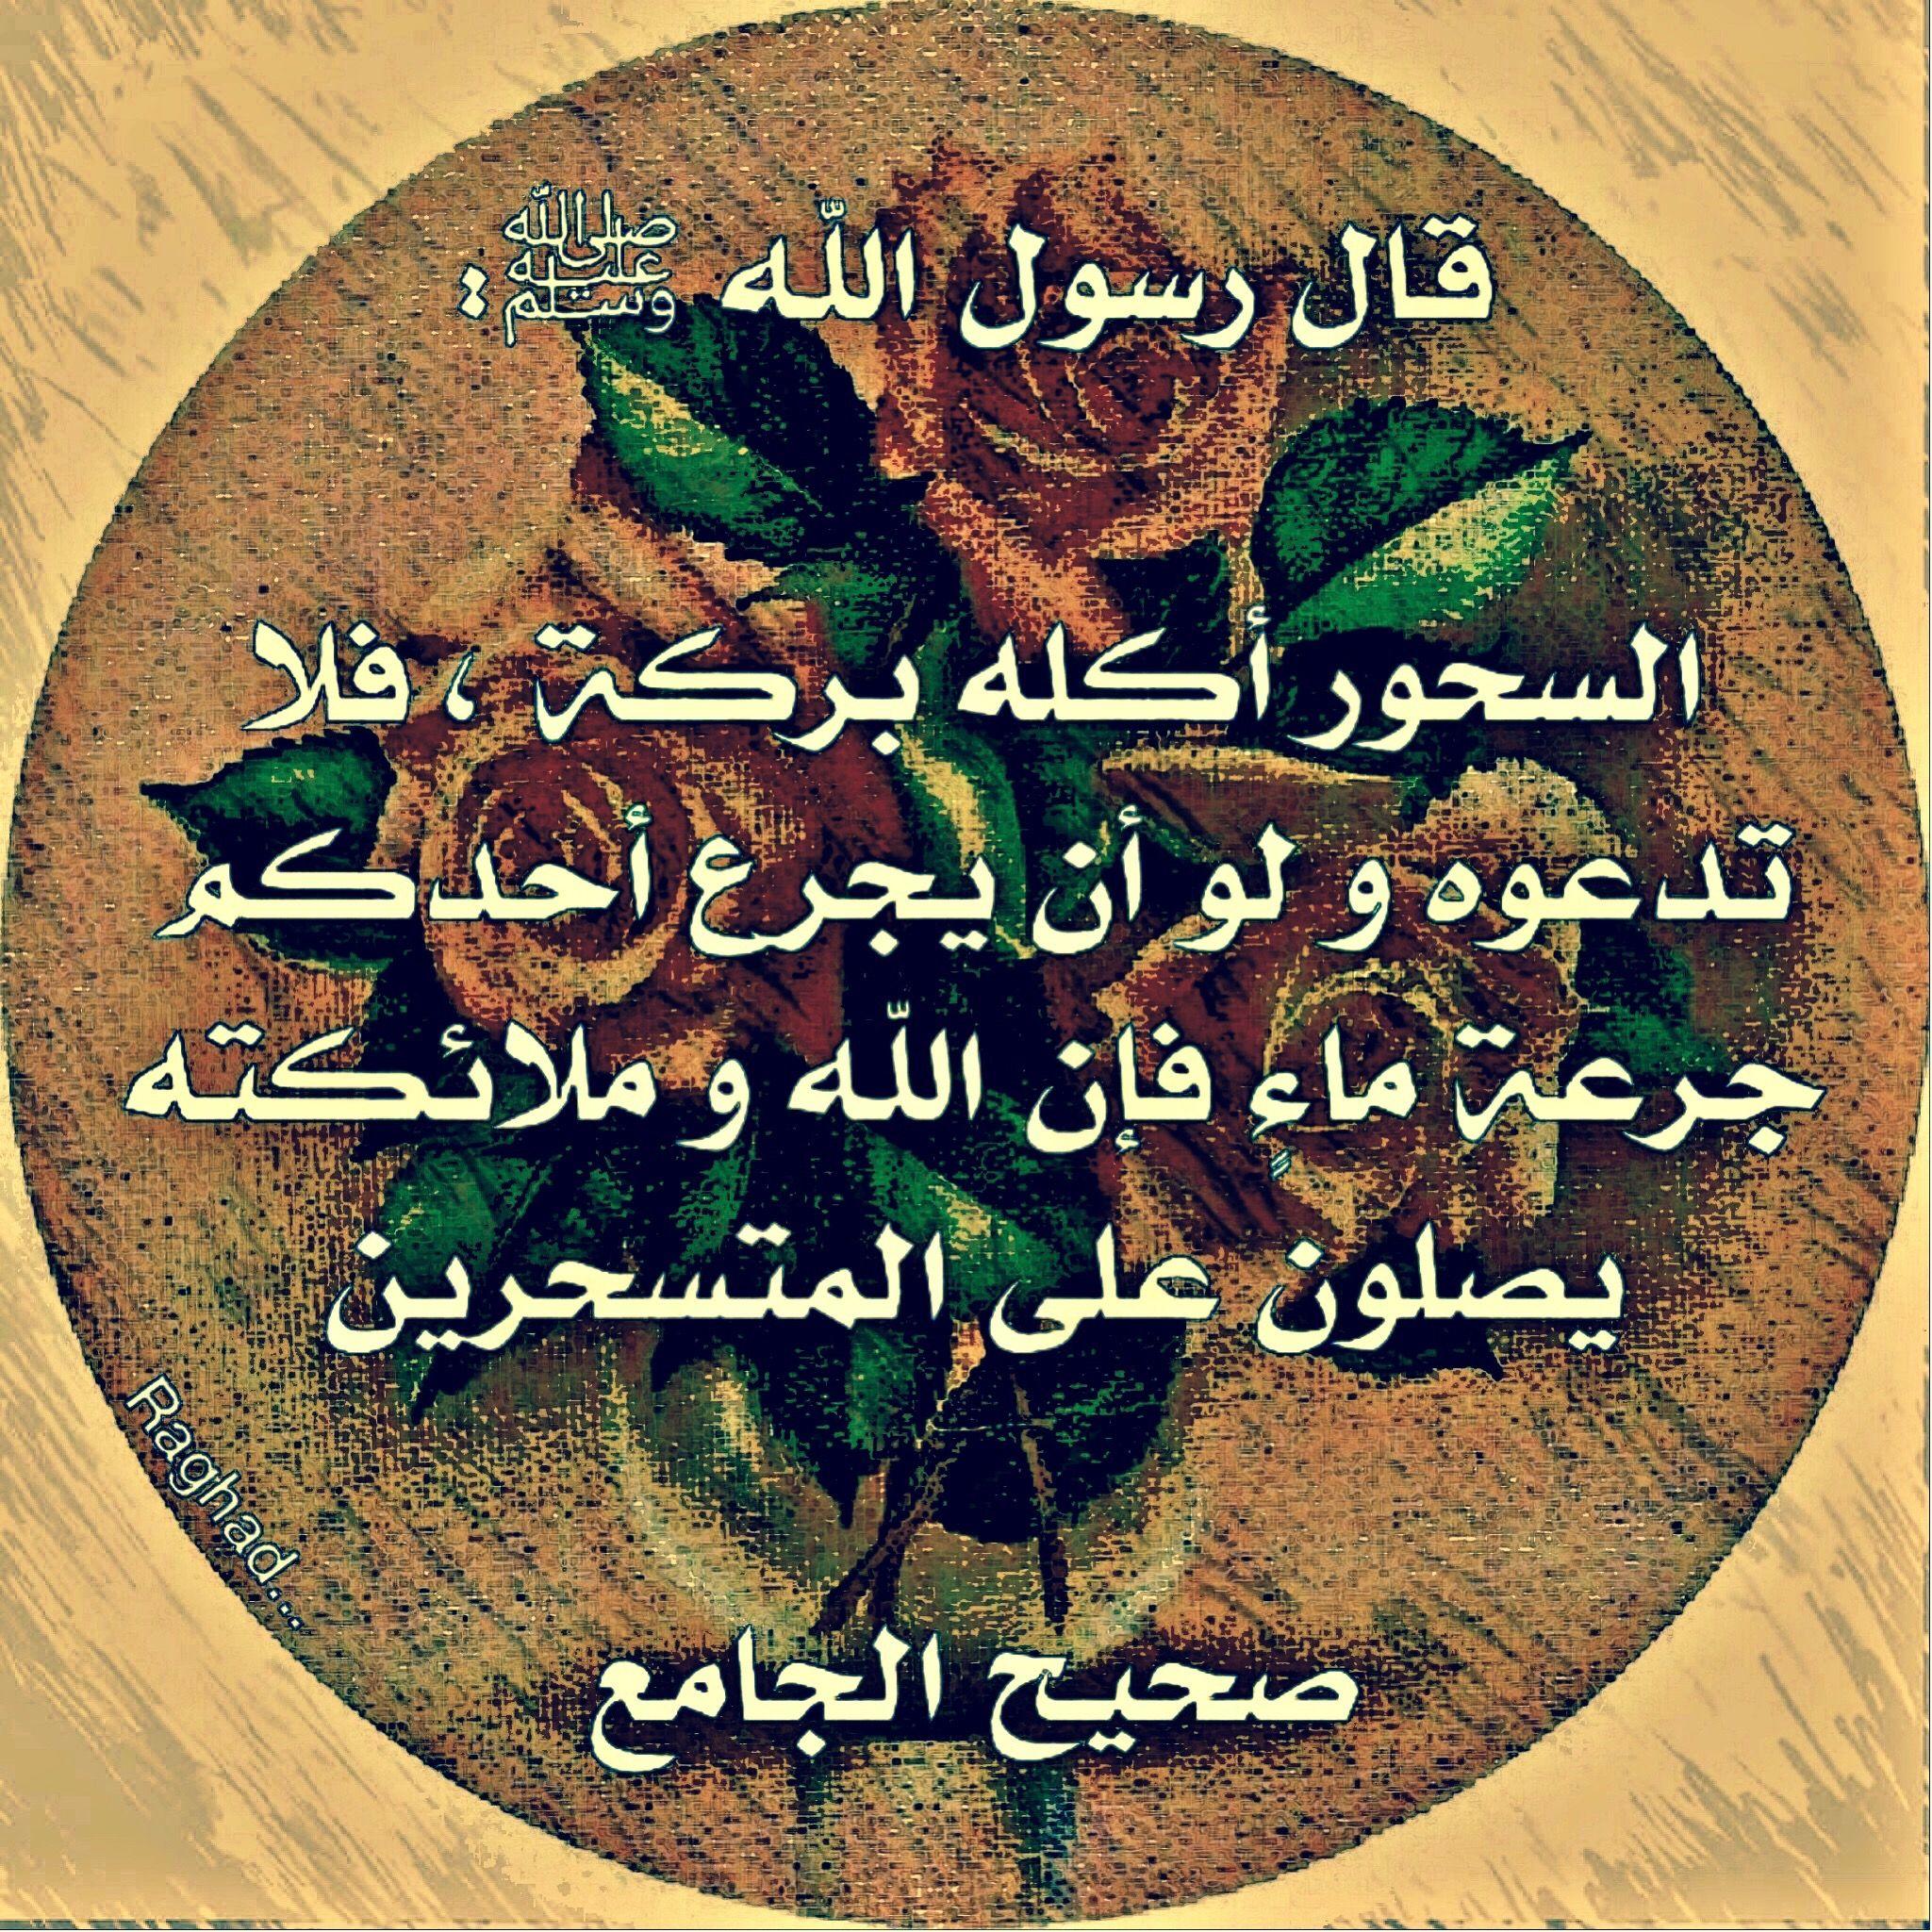 Desertrose اللذ ة الحقيقية التي بوسعك أن تحصل عليها هي سجدة لله بدون موعد أو مناسبة لا تحمل أفكارا أ خرى سوى العبودية بيقي Ramadan Islam Ramadan Kareem